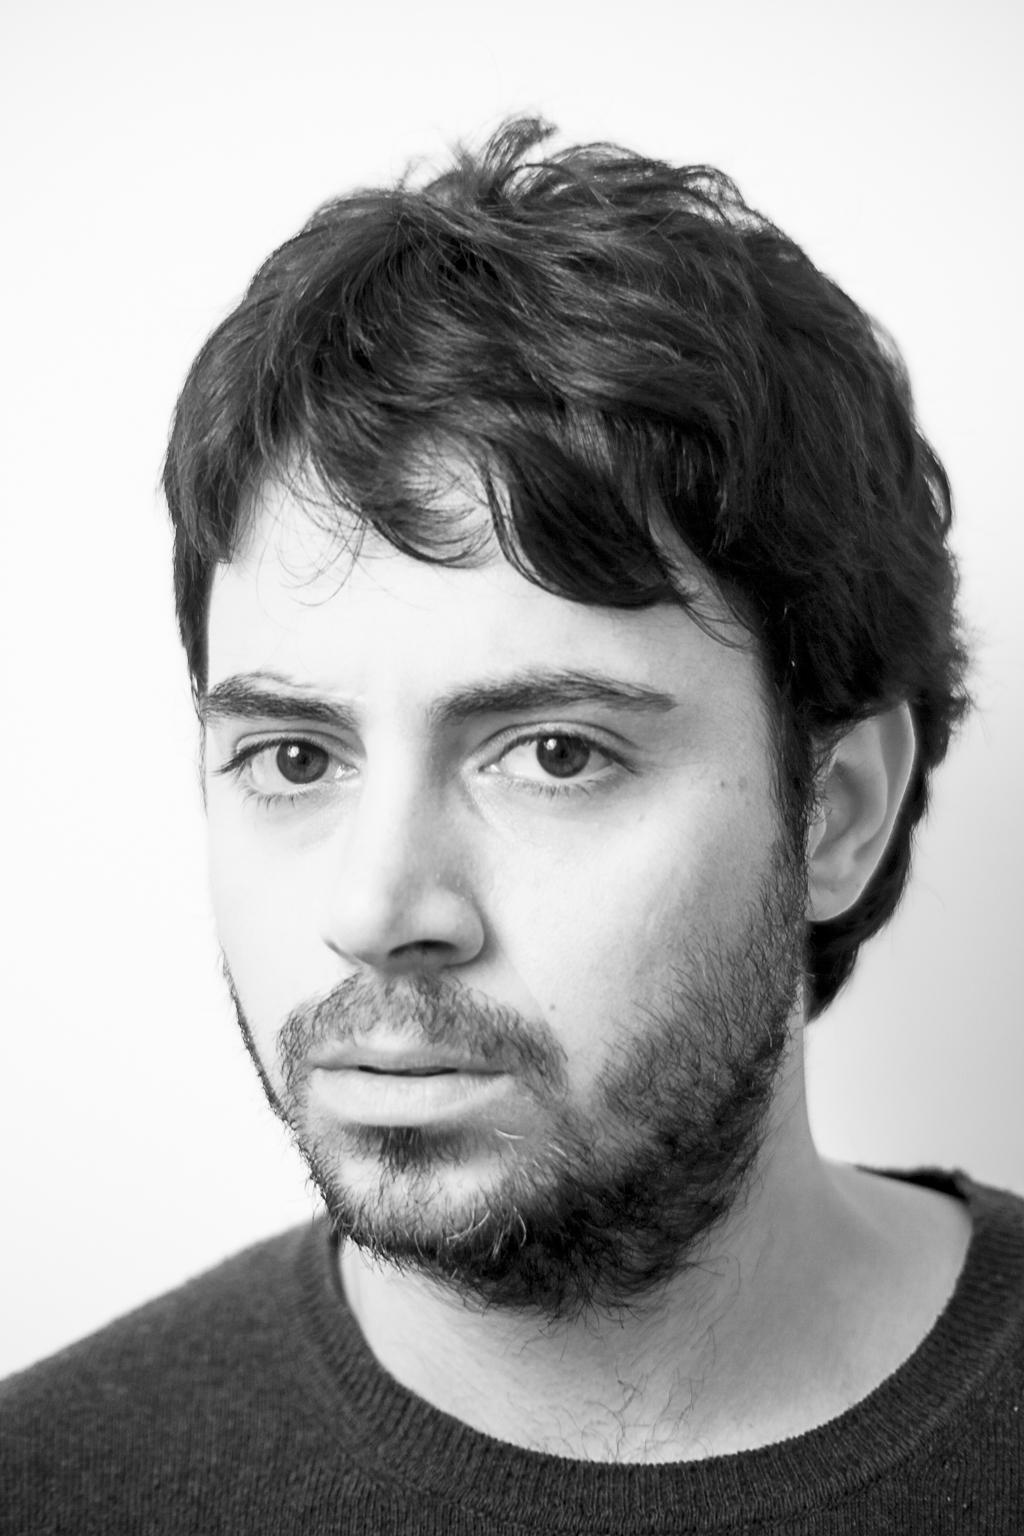 Antonio Ottomanelli